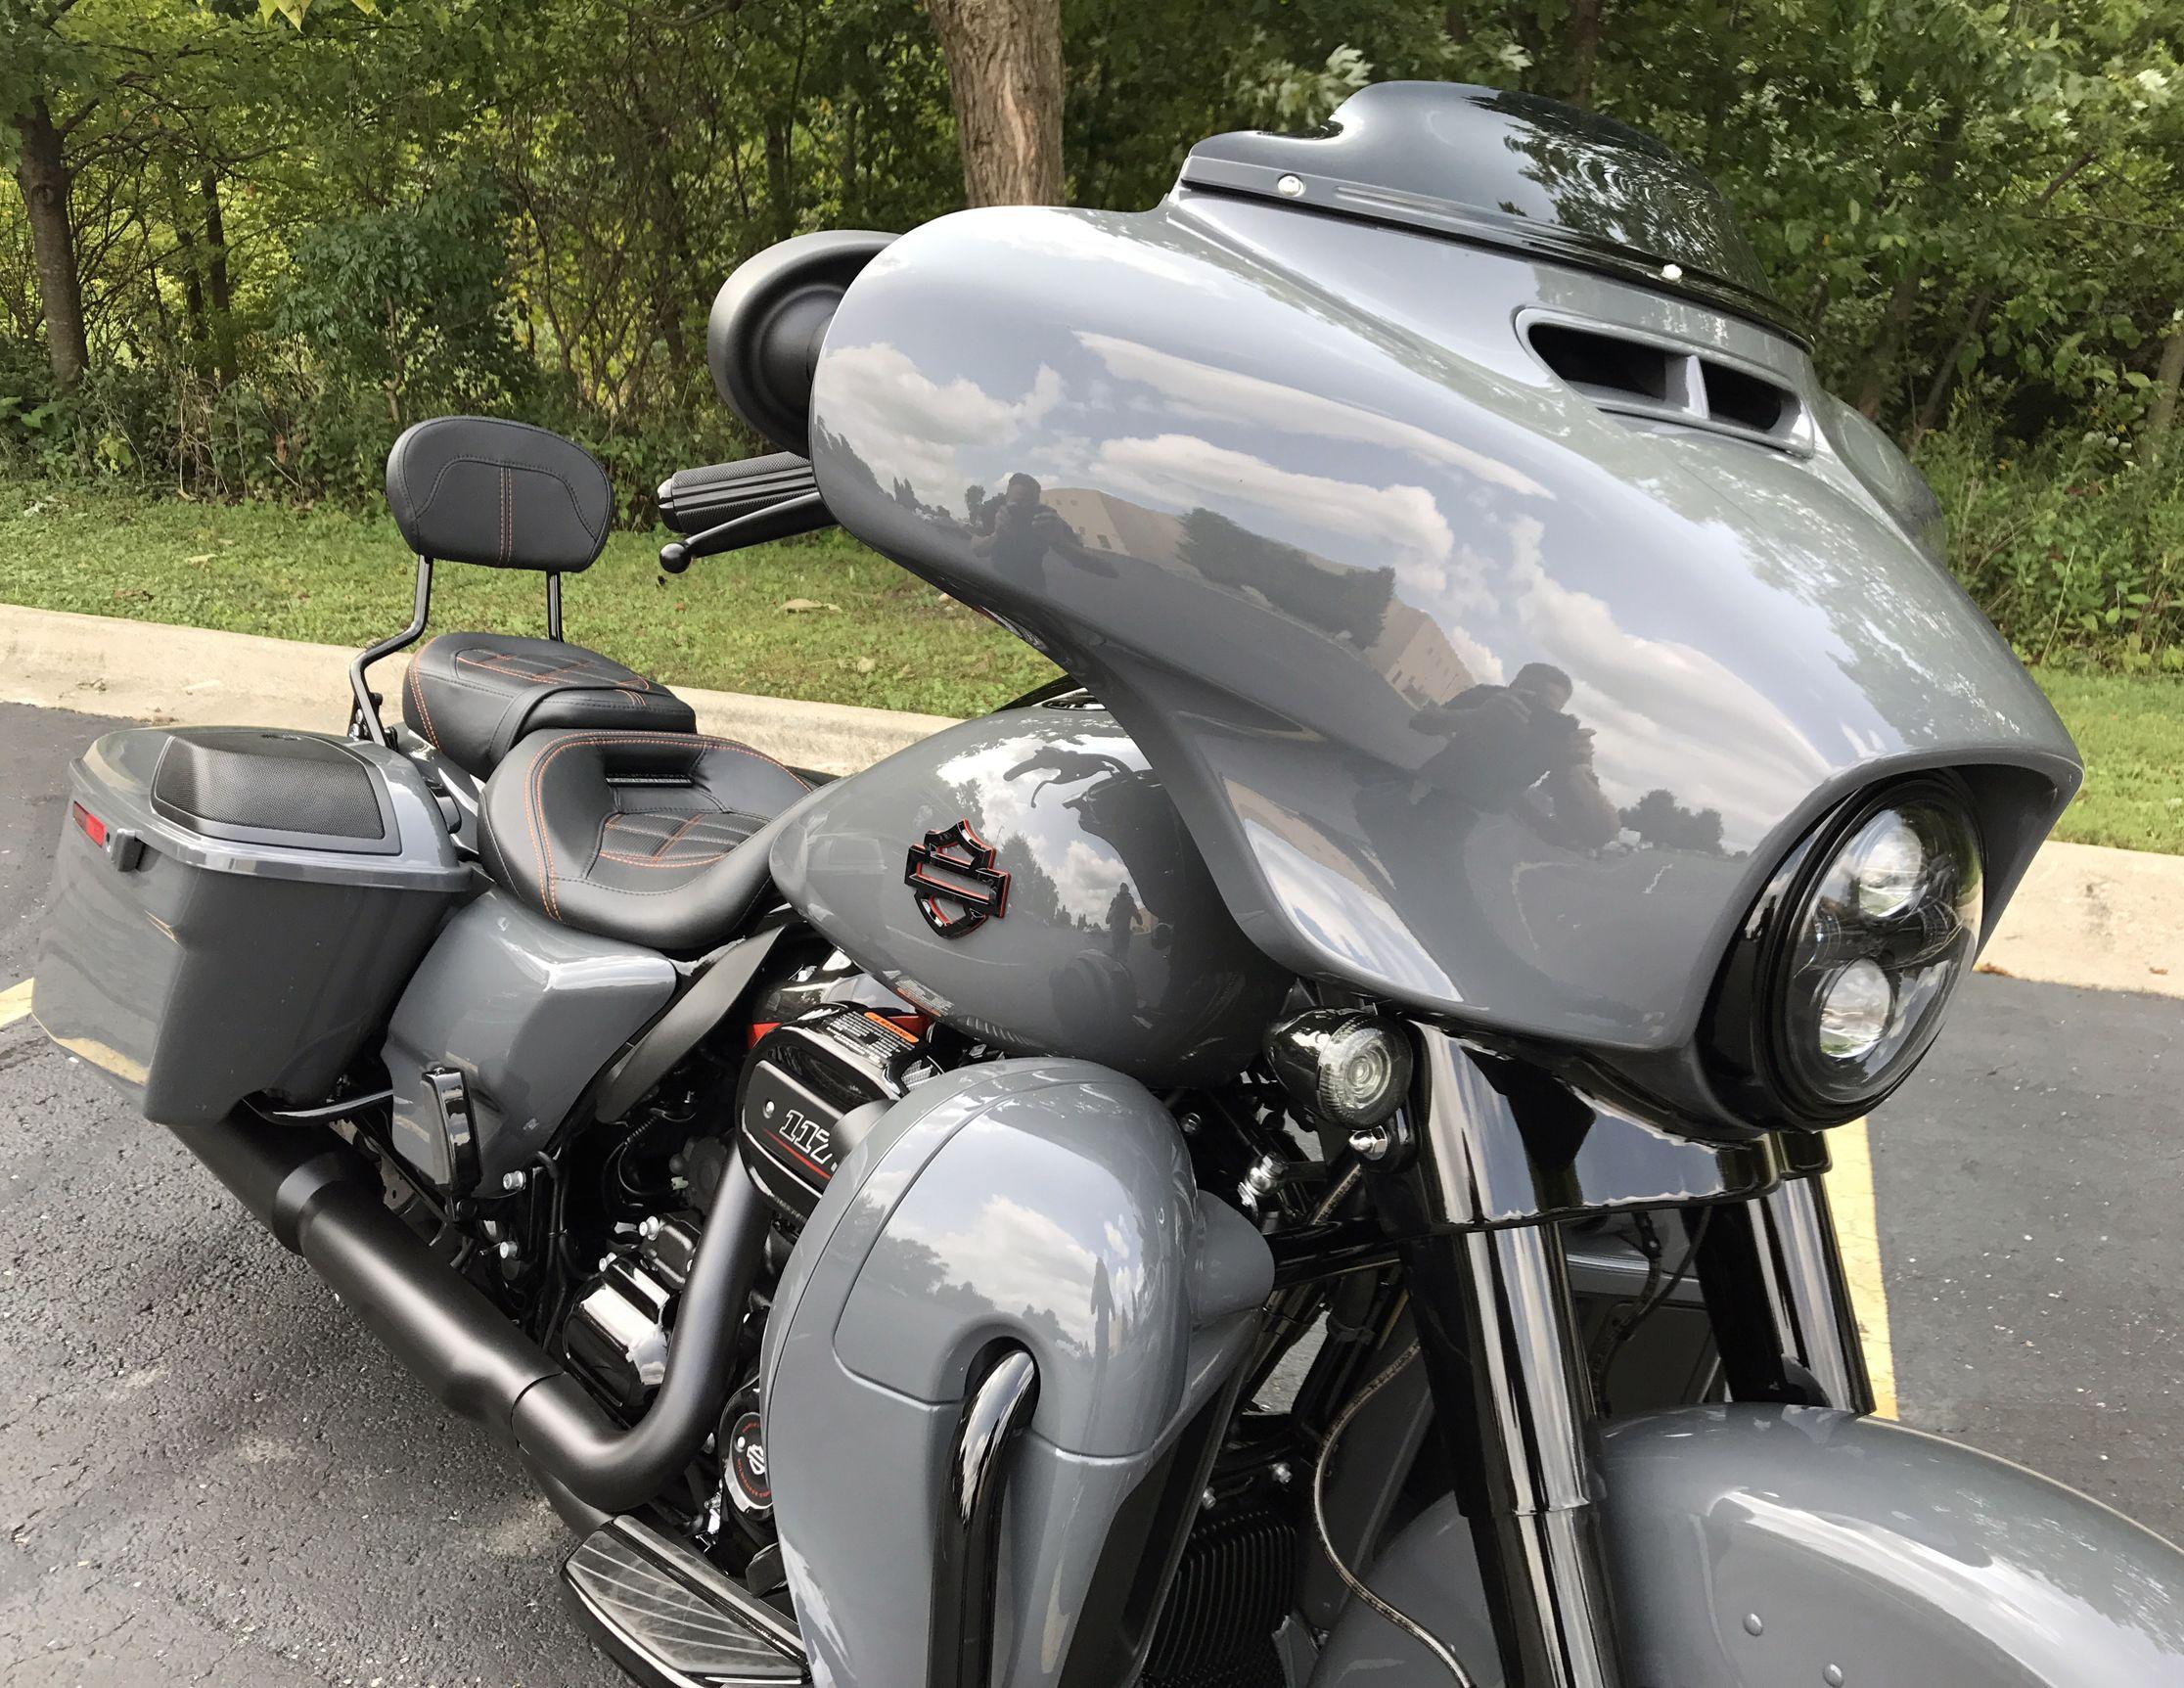 Perfection 2018 Cvo Street Glide Harley Davidson Bikes